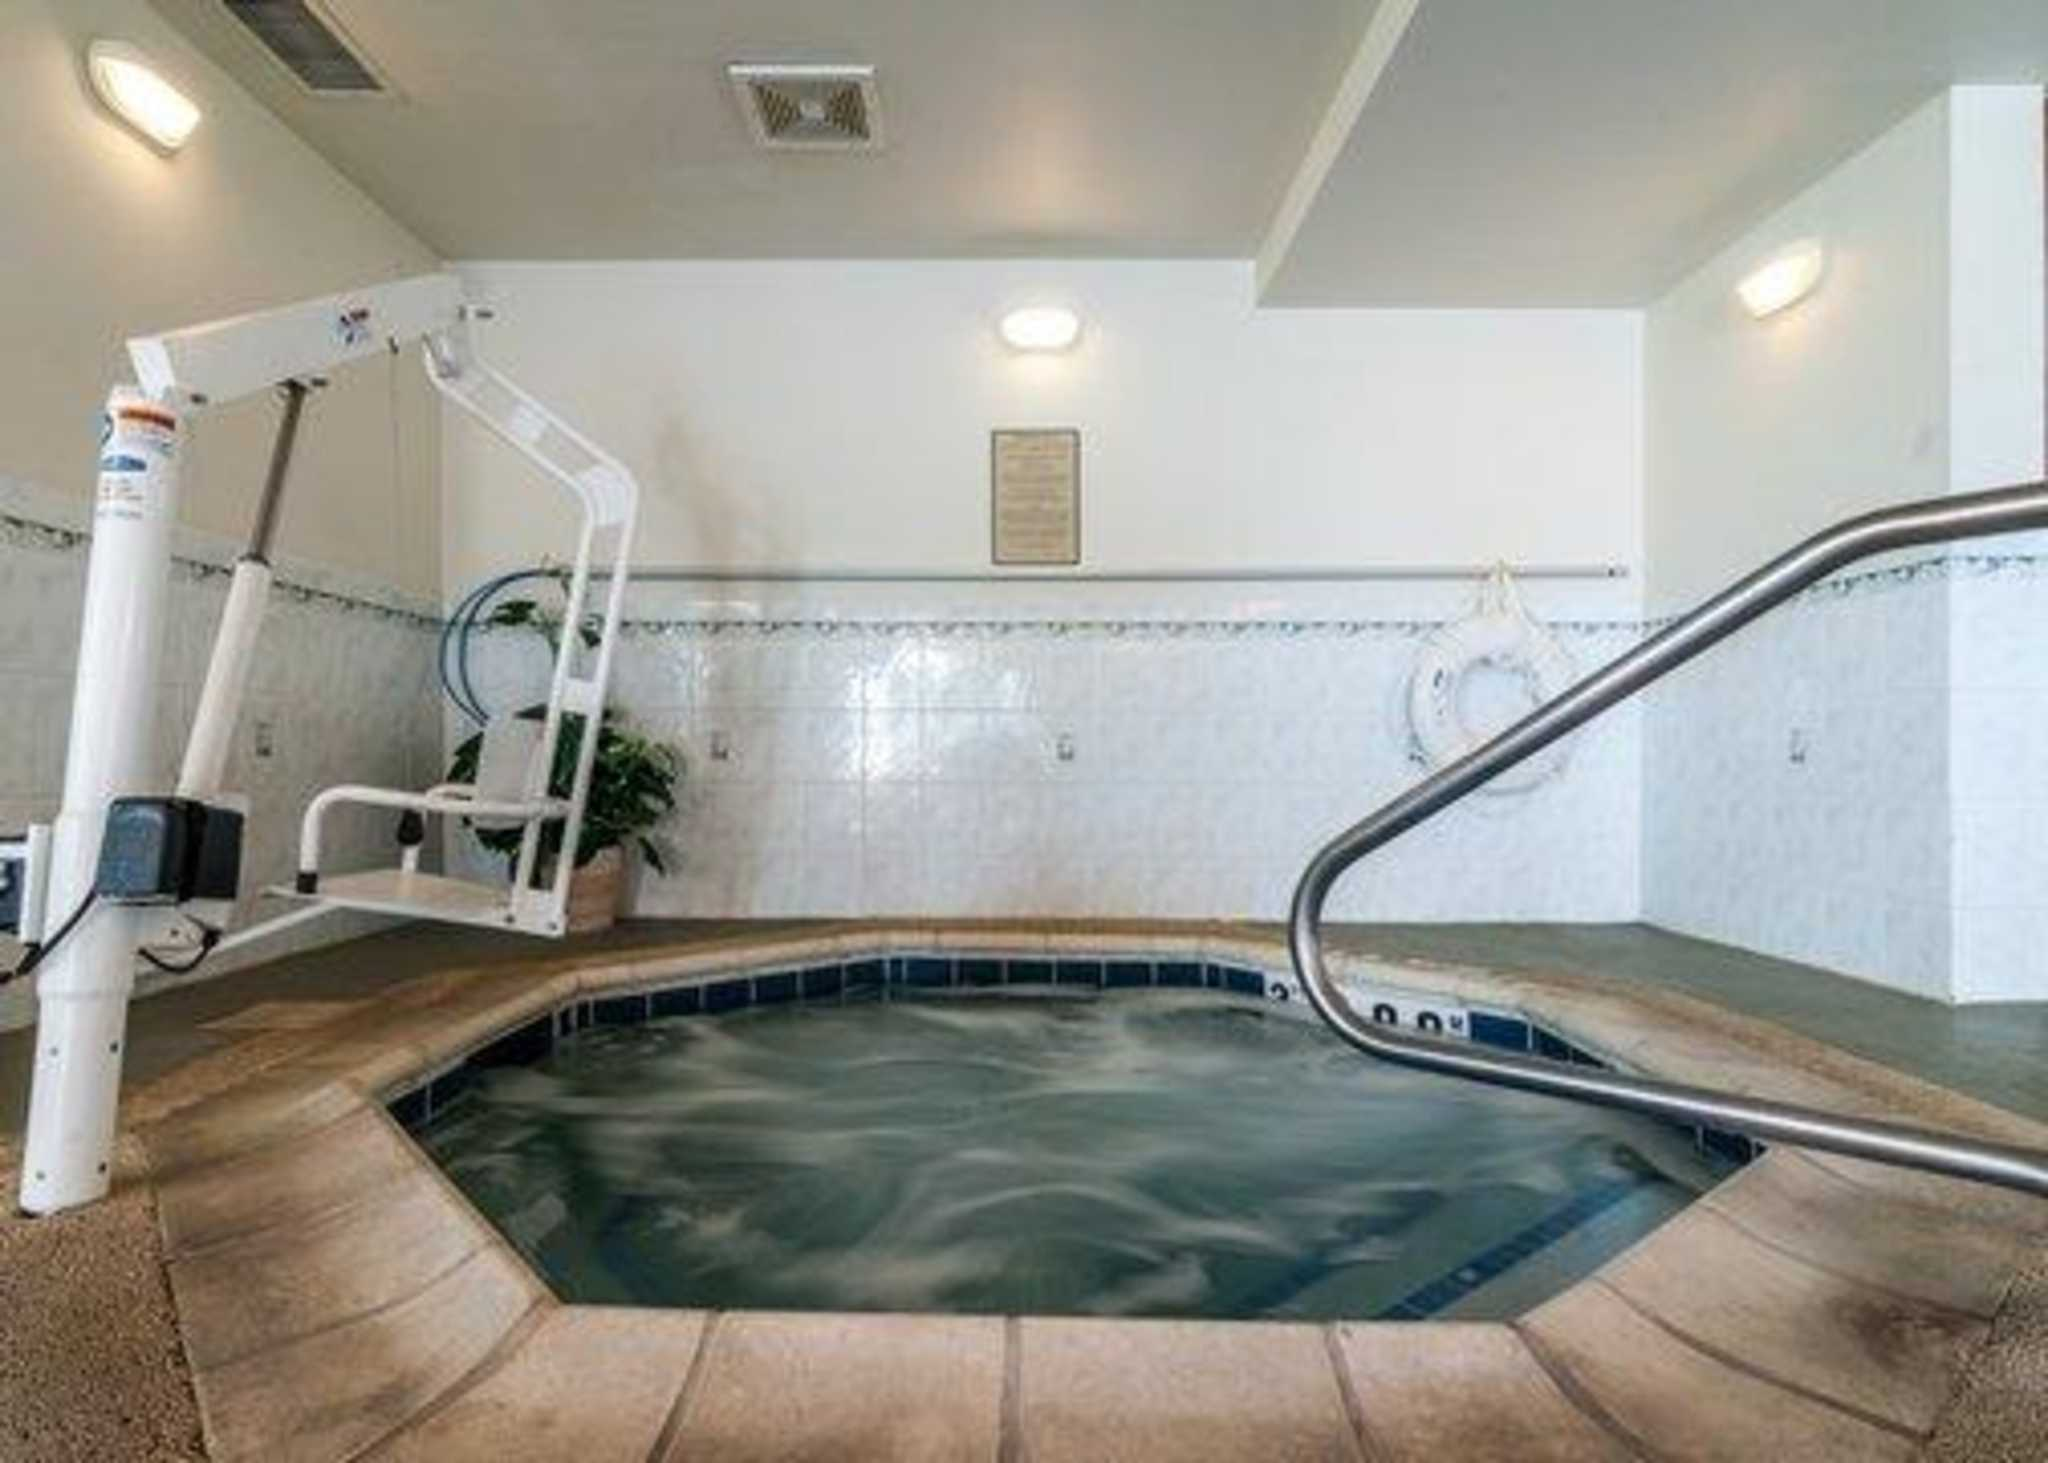 Comfort Inn Amp Suites Coupons Geneva Il Near Me 8coupons